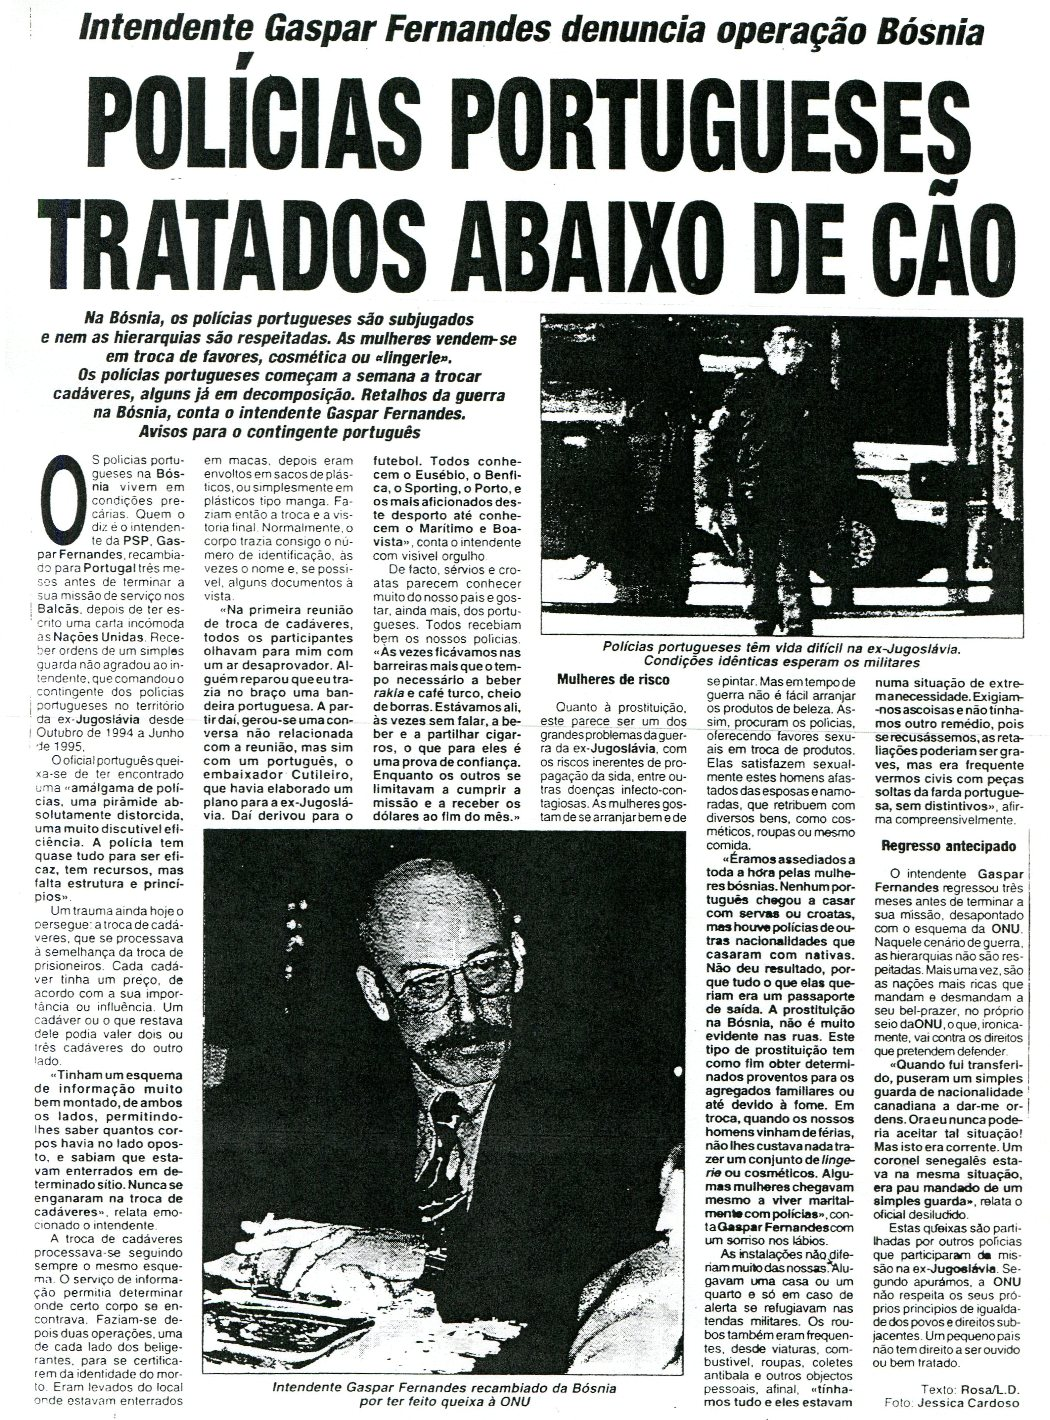 25JAN96 - O Crime